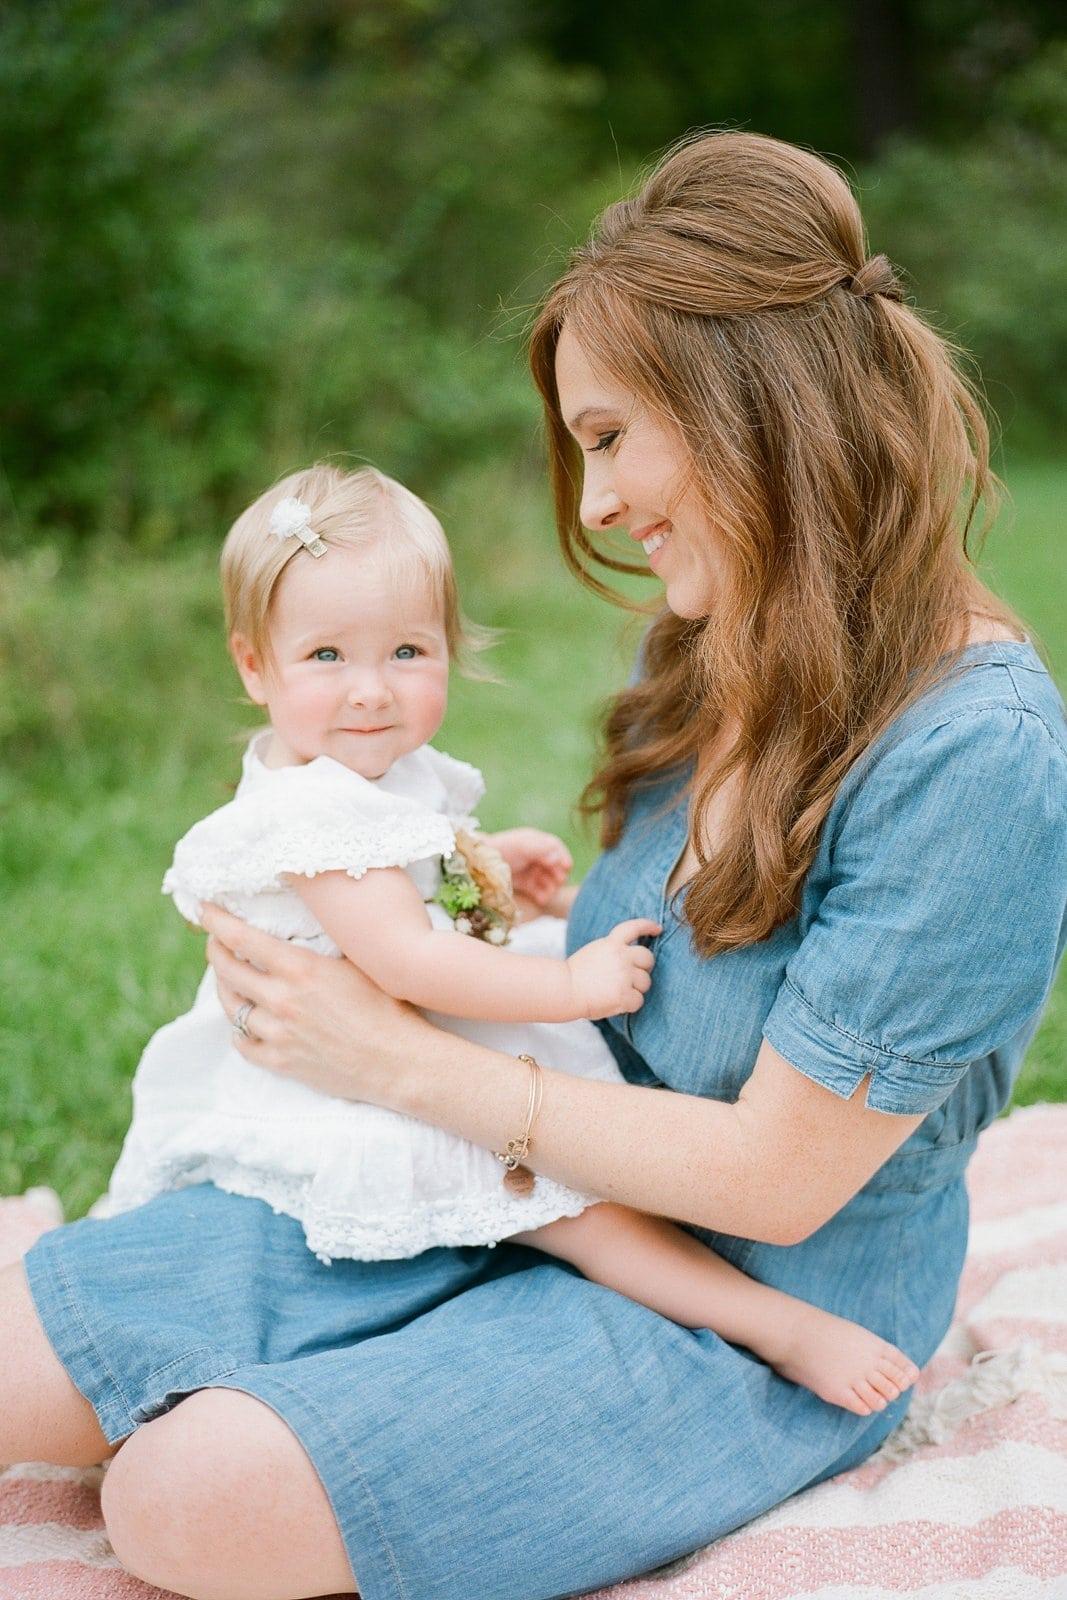 Mom holding her little girl in her lap